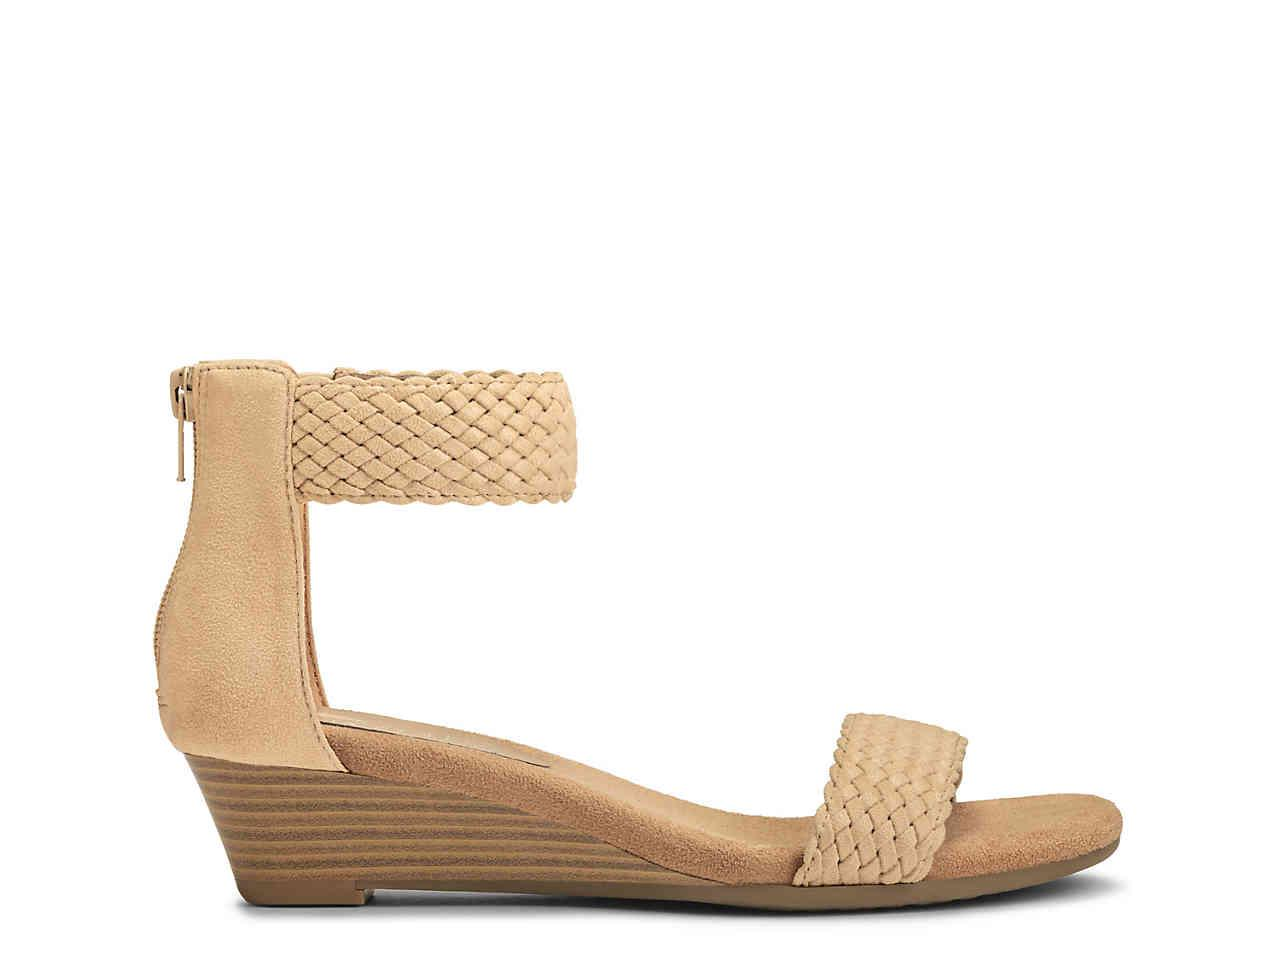 0c1dba876b3 Lyst - Aerosoles Yetroactive Wedge Sandal